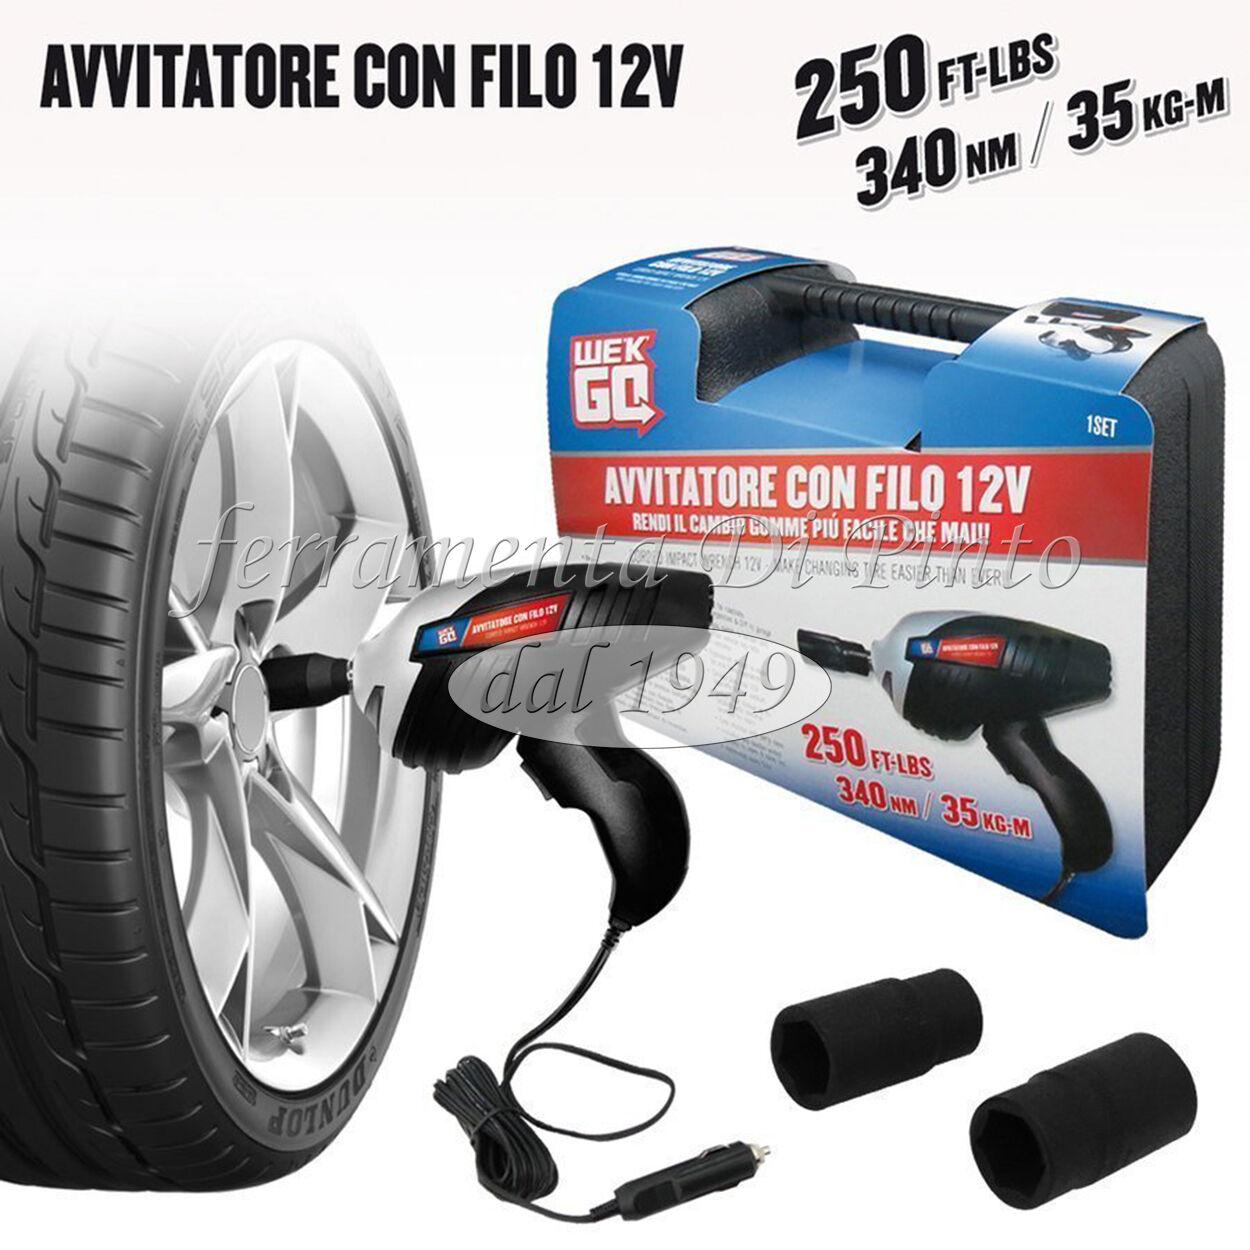 Avvitatore Impulsi Professionale svita avvita bulloni pneumatic cer  ruote 12v